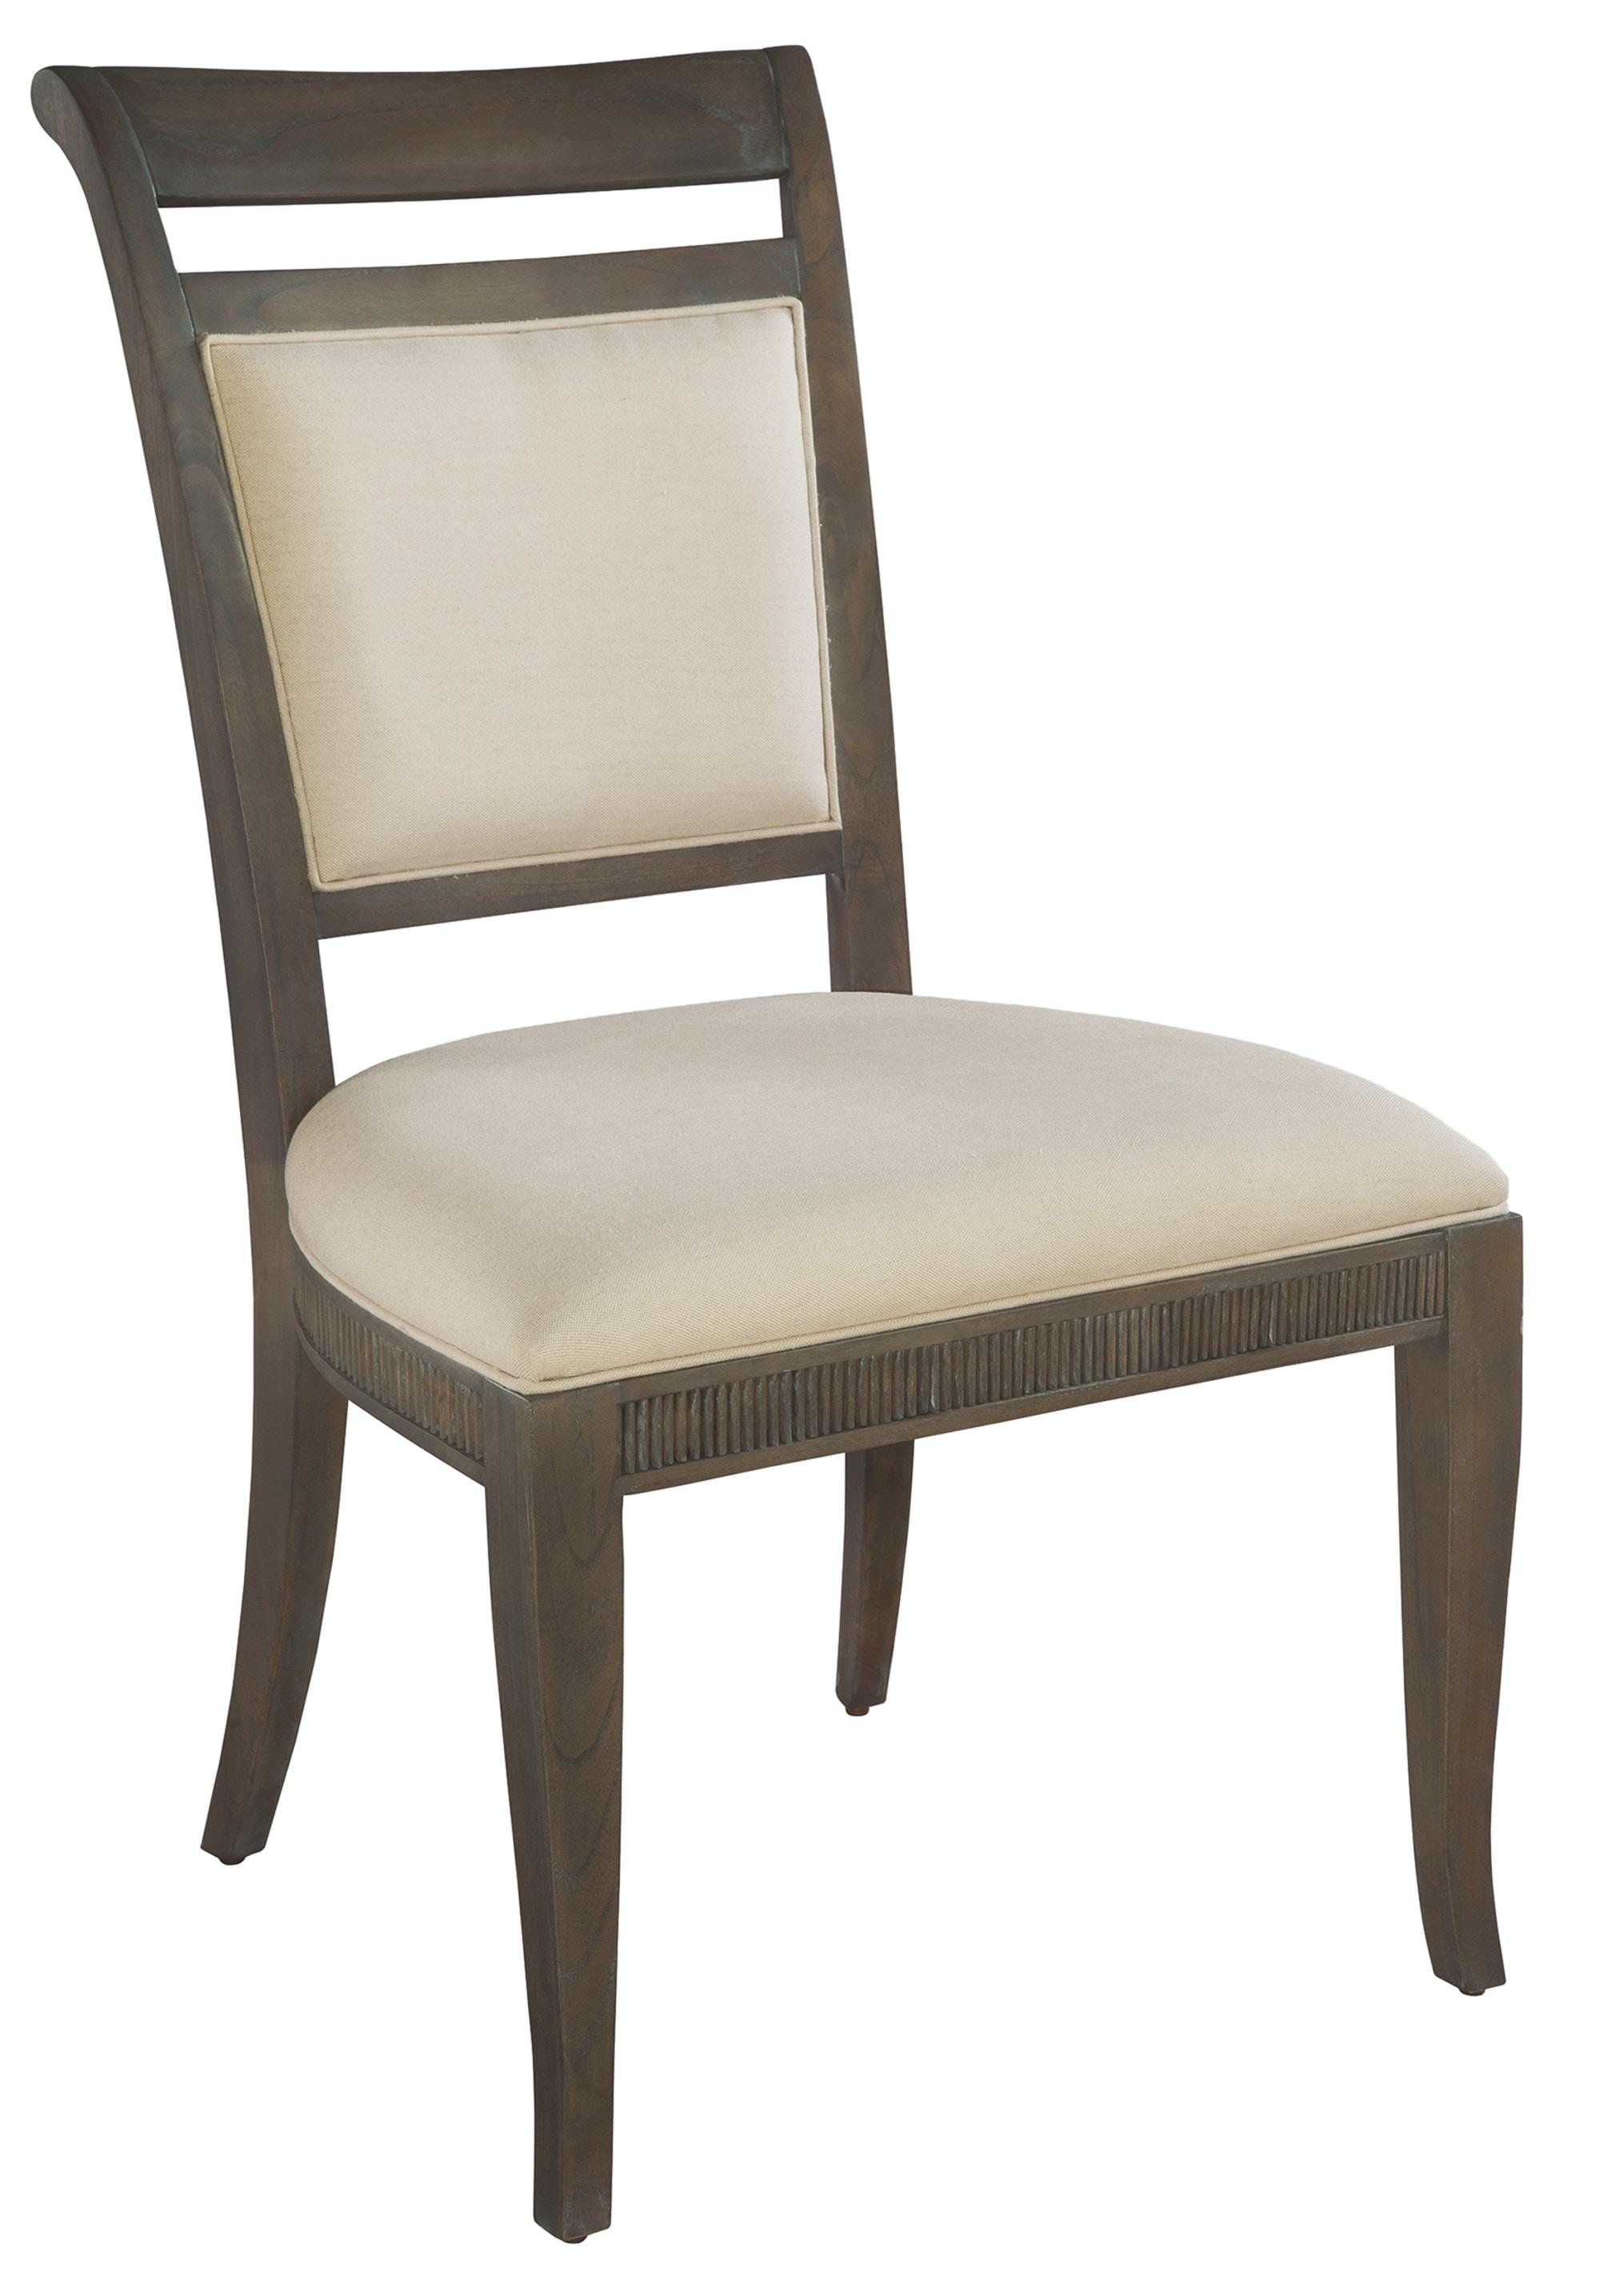 Ordinaire Hekman Furniture 952222SU Hekman Urban Retreat Dining Upholstered Side Chair